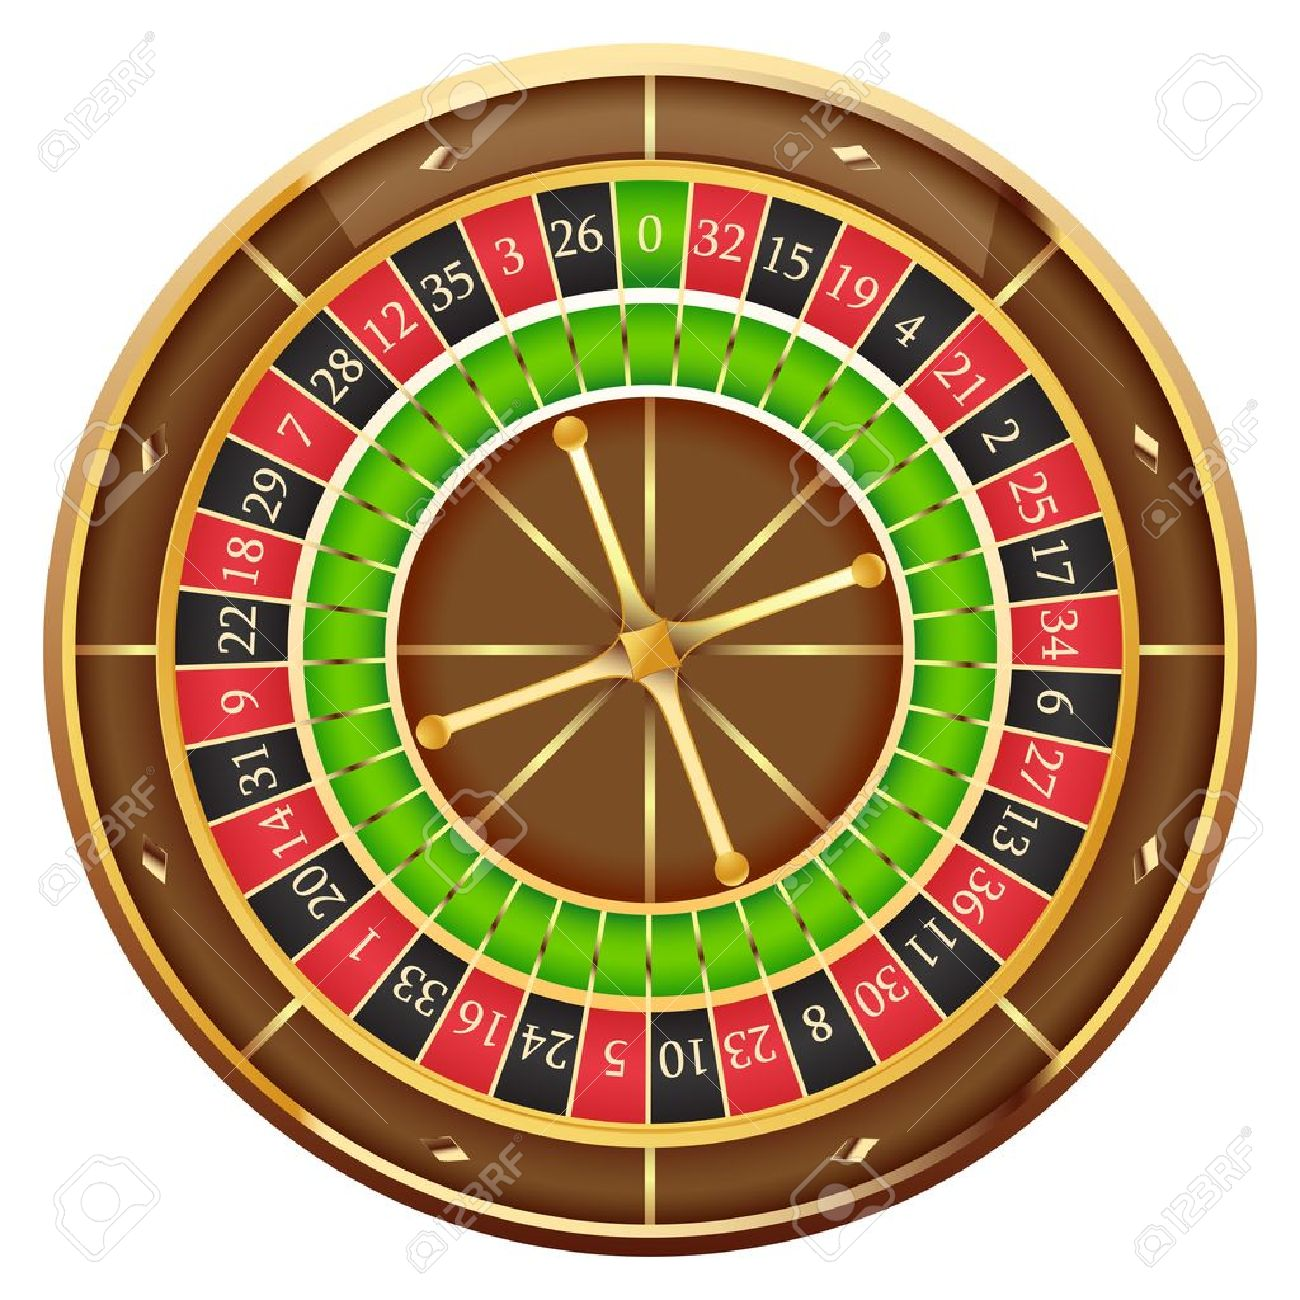 Wheel of fortune - 11127489